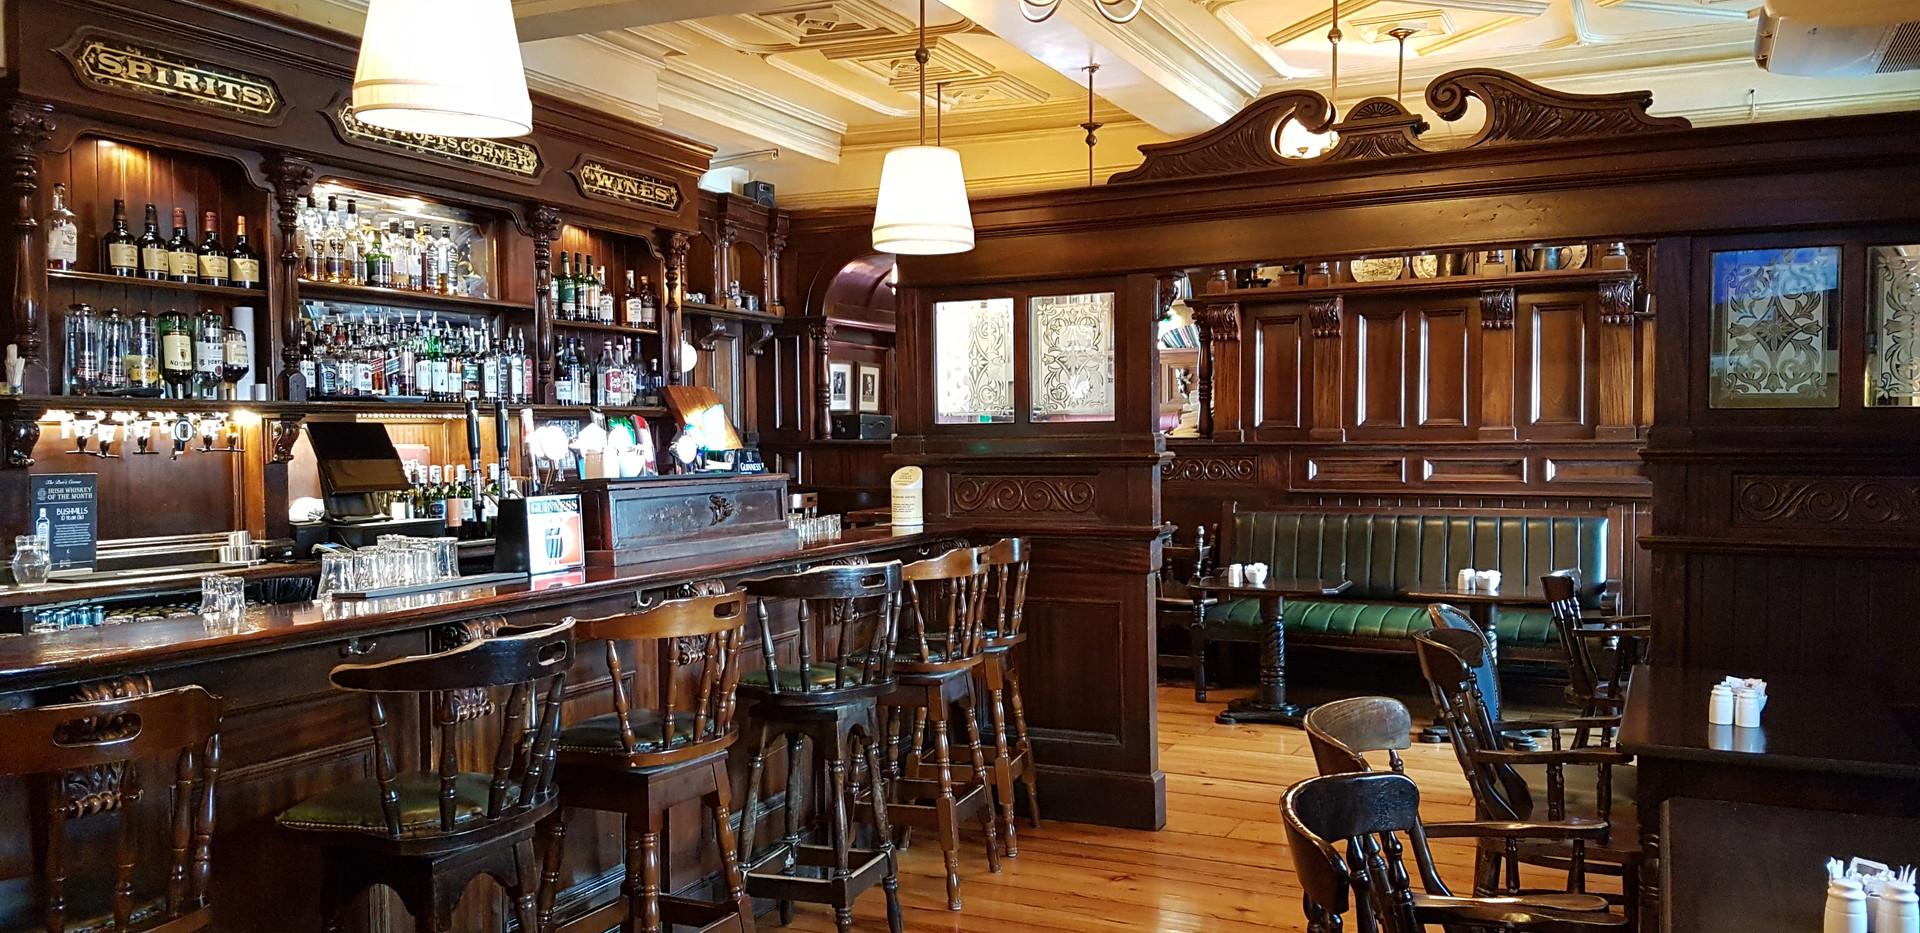 Old Ground Hotel, Ennis, Co. Clare, The Poets Corner, Flynn Hotels